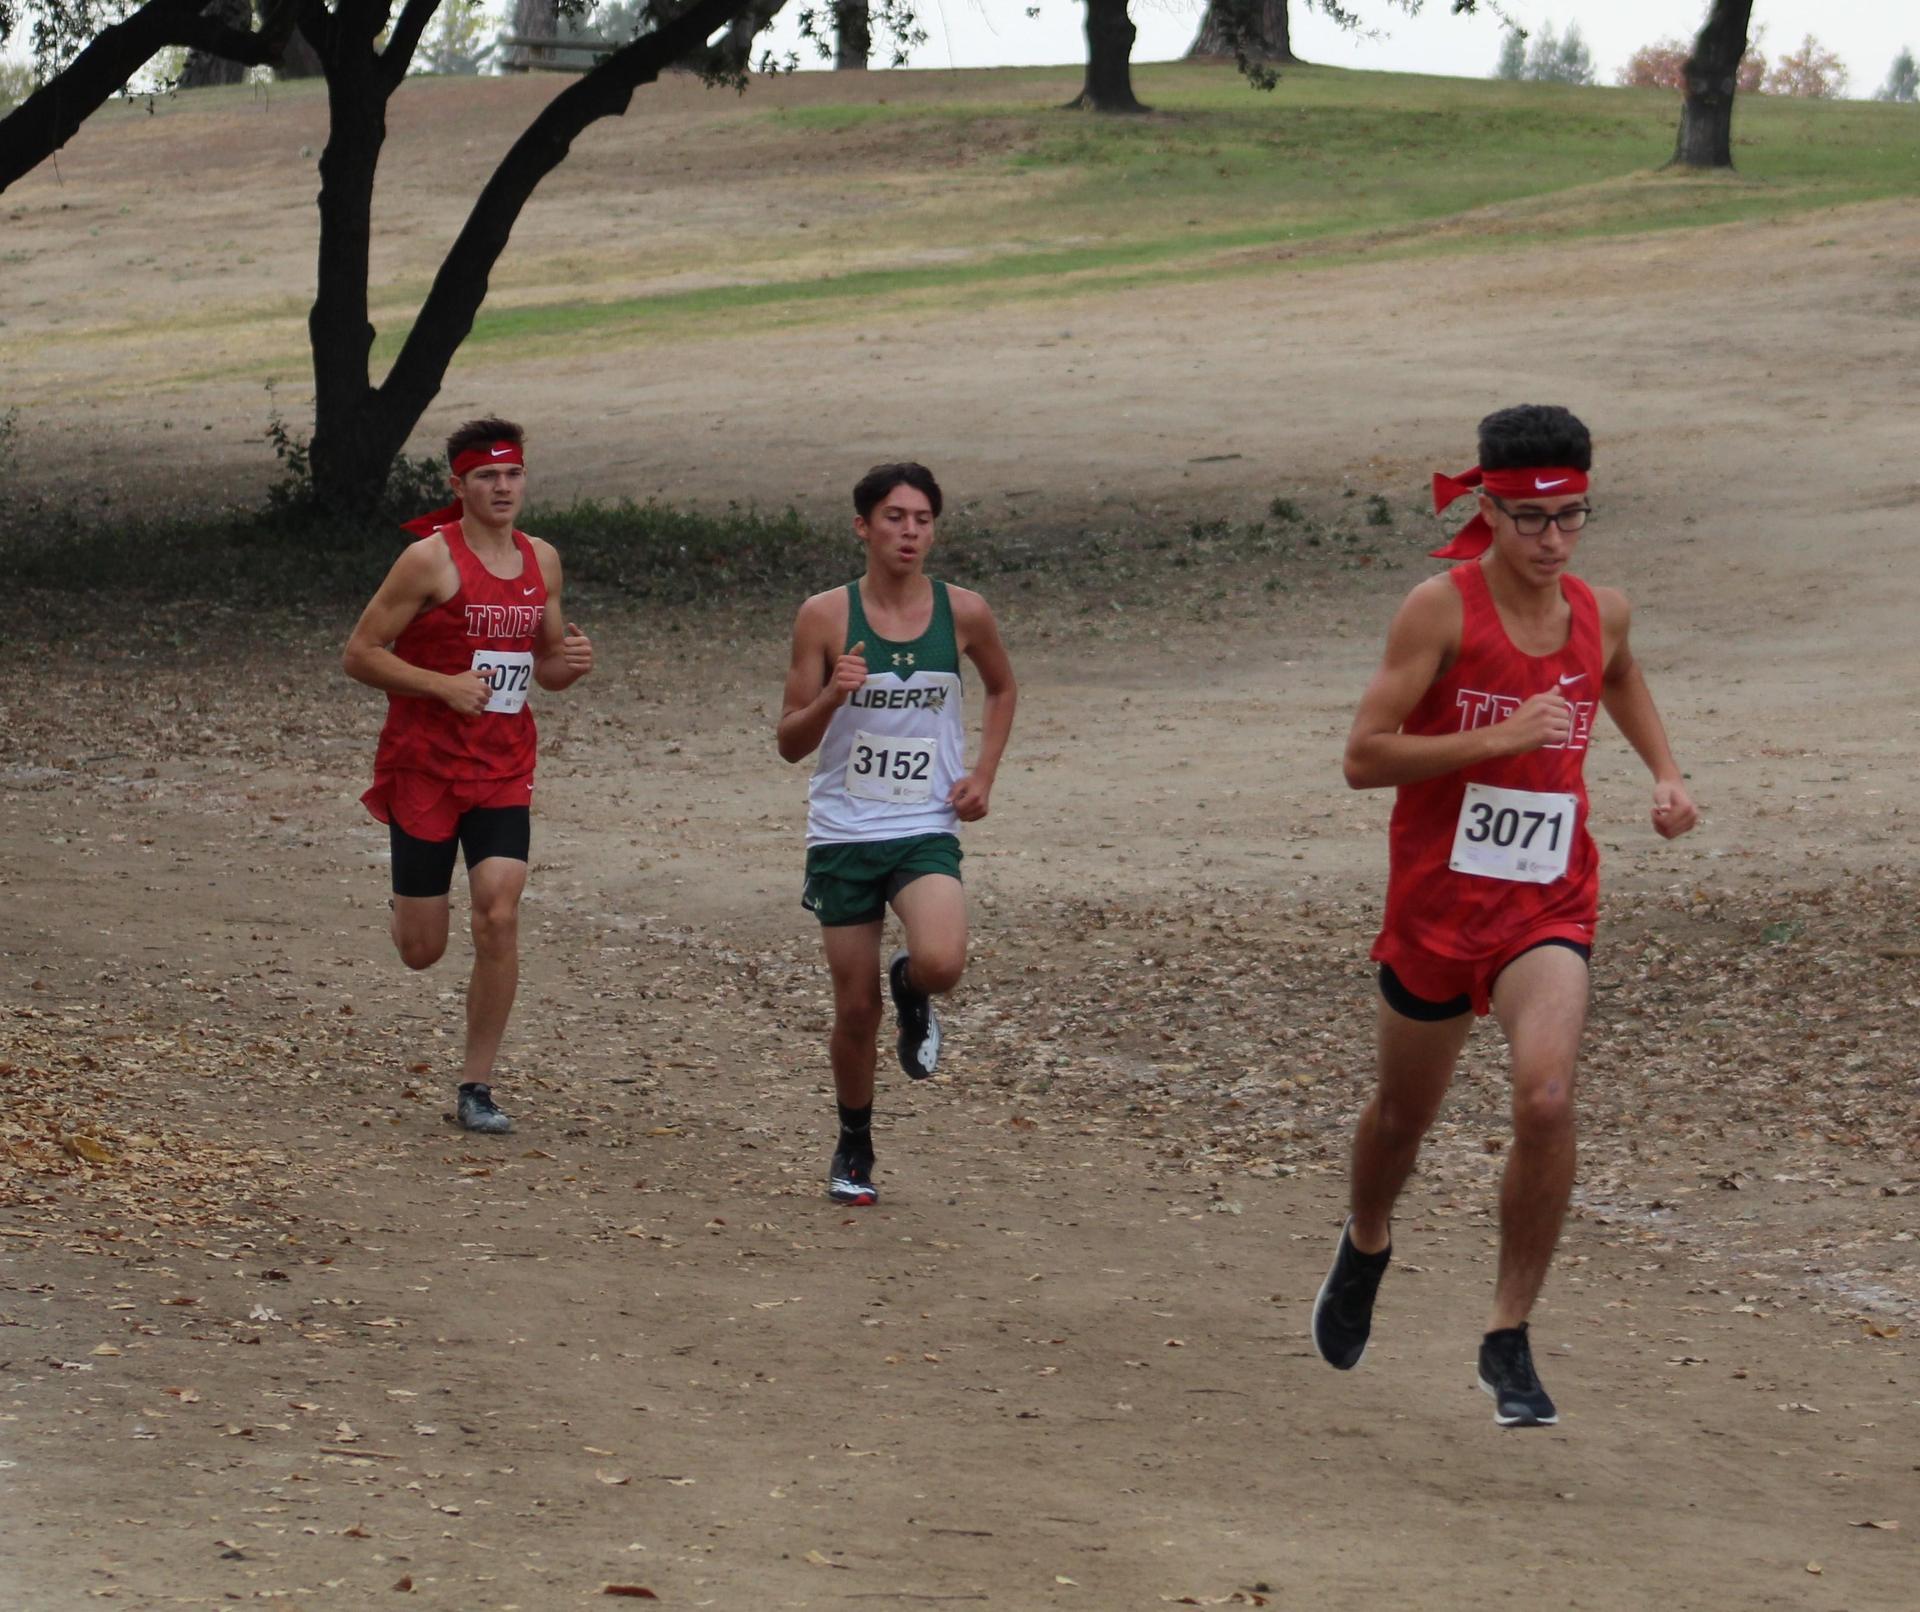 Ryan Diaz and Andrew Castaneda  racing at woodward park